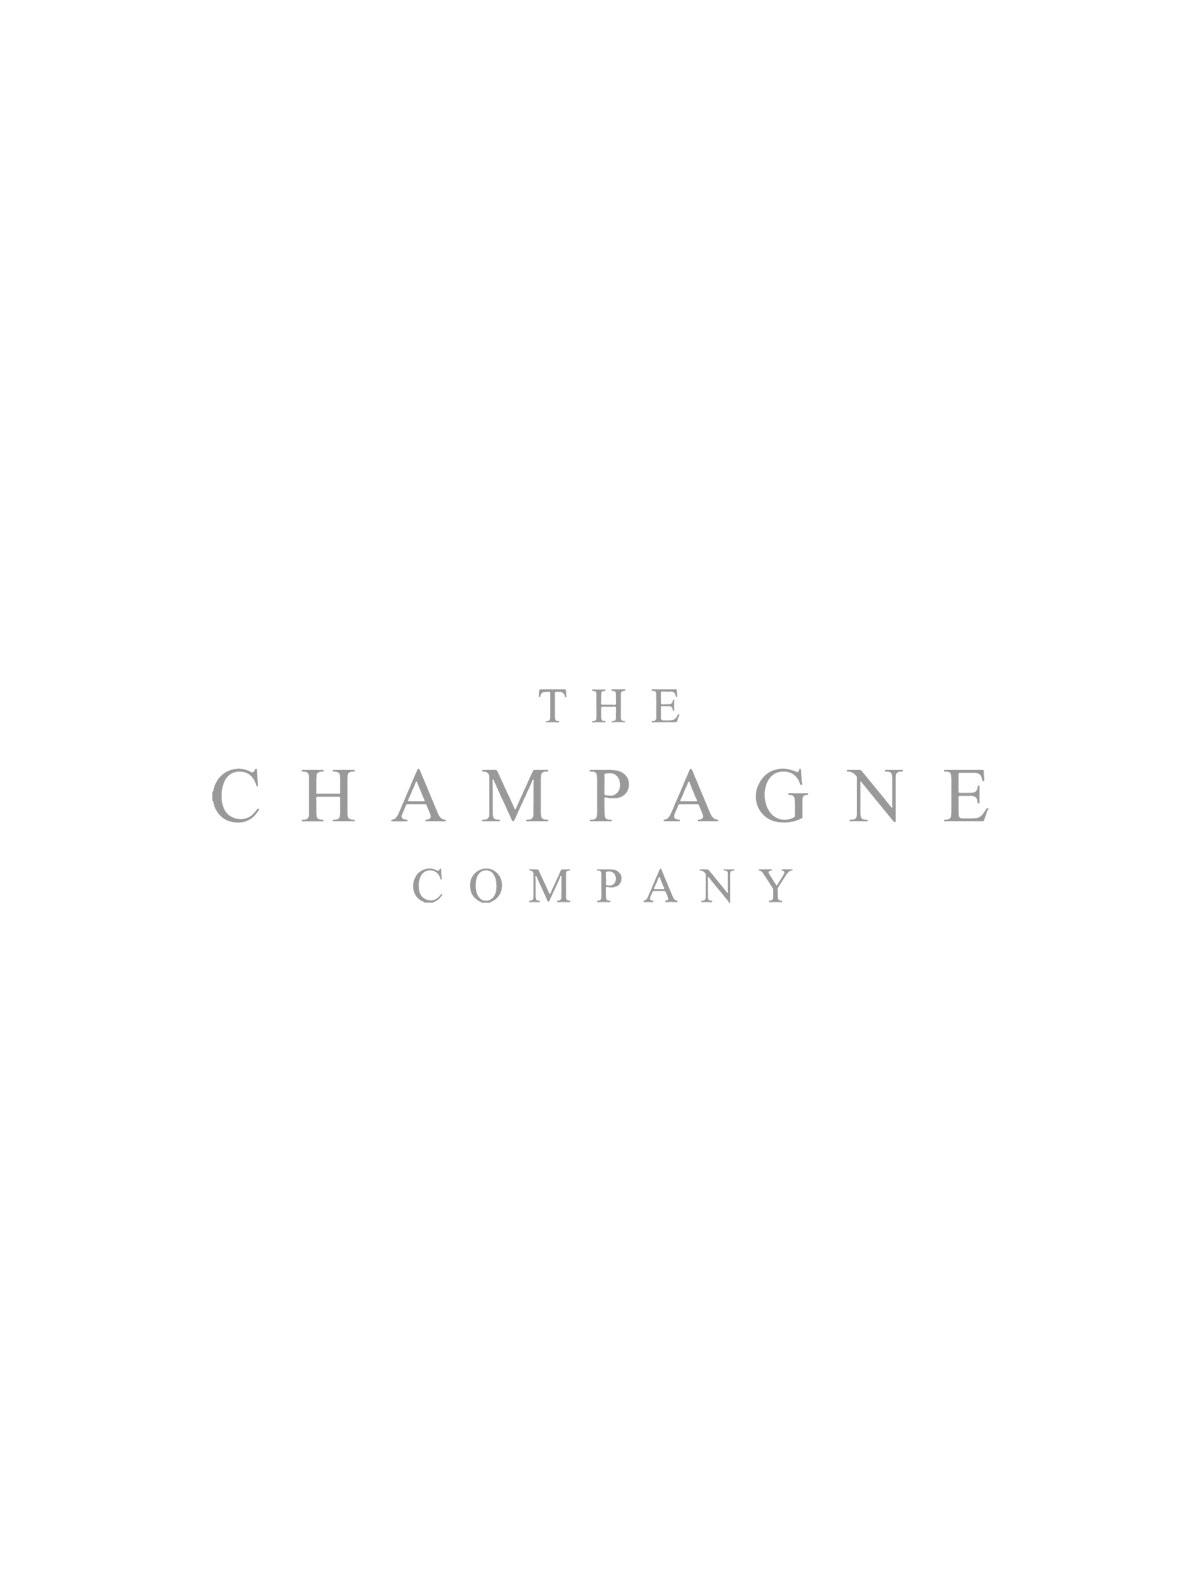 Terrazas de los Andes Wine Gift -Argentina (2 Bottles & Wood Gift Box)